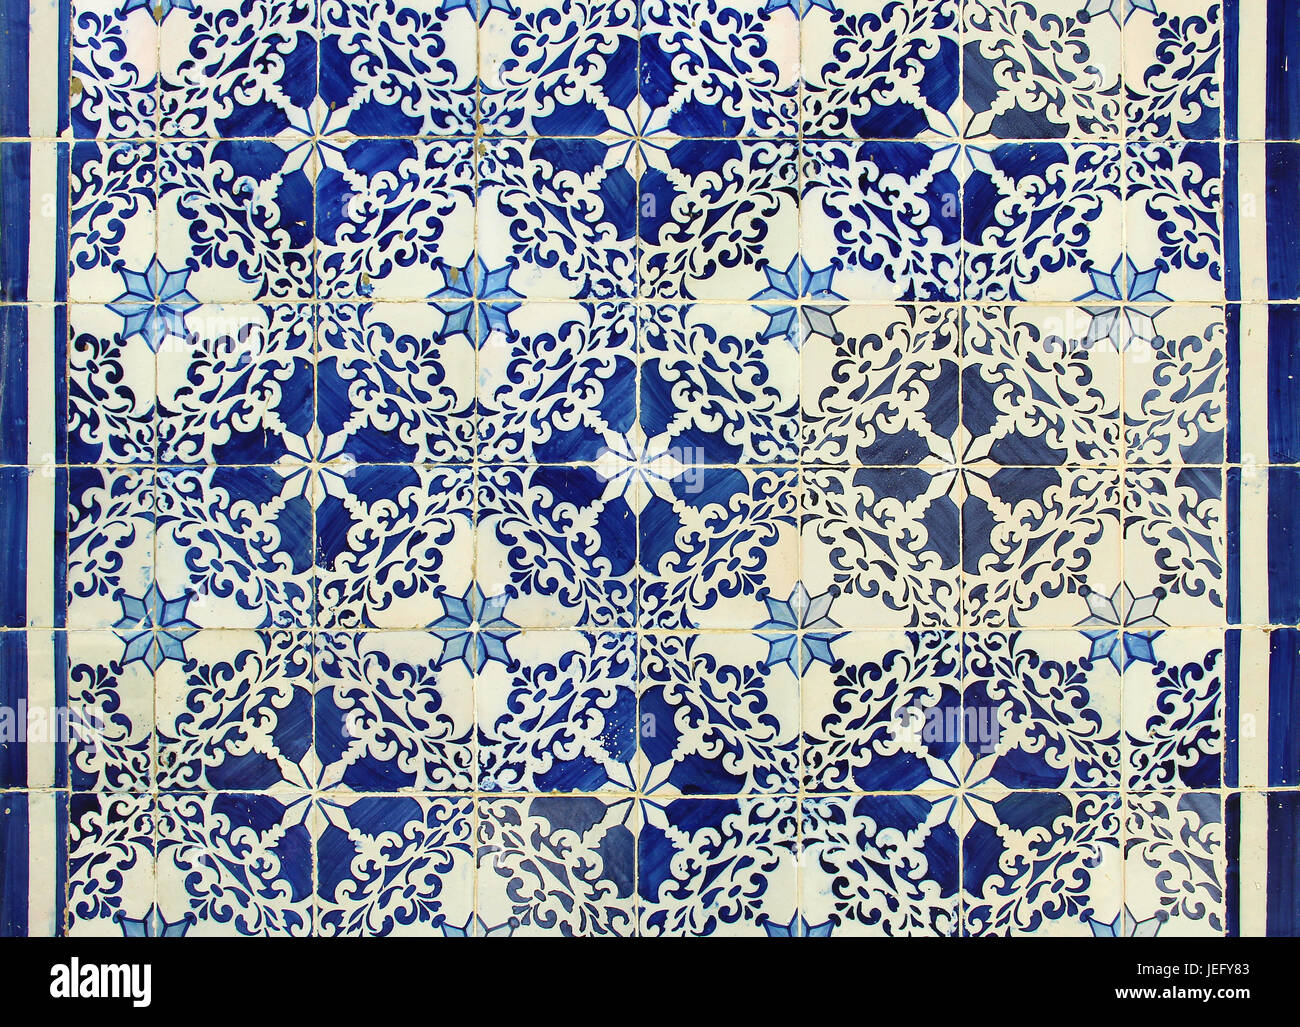 Traditional Portuguese azulejos tiles - Stock Image